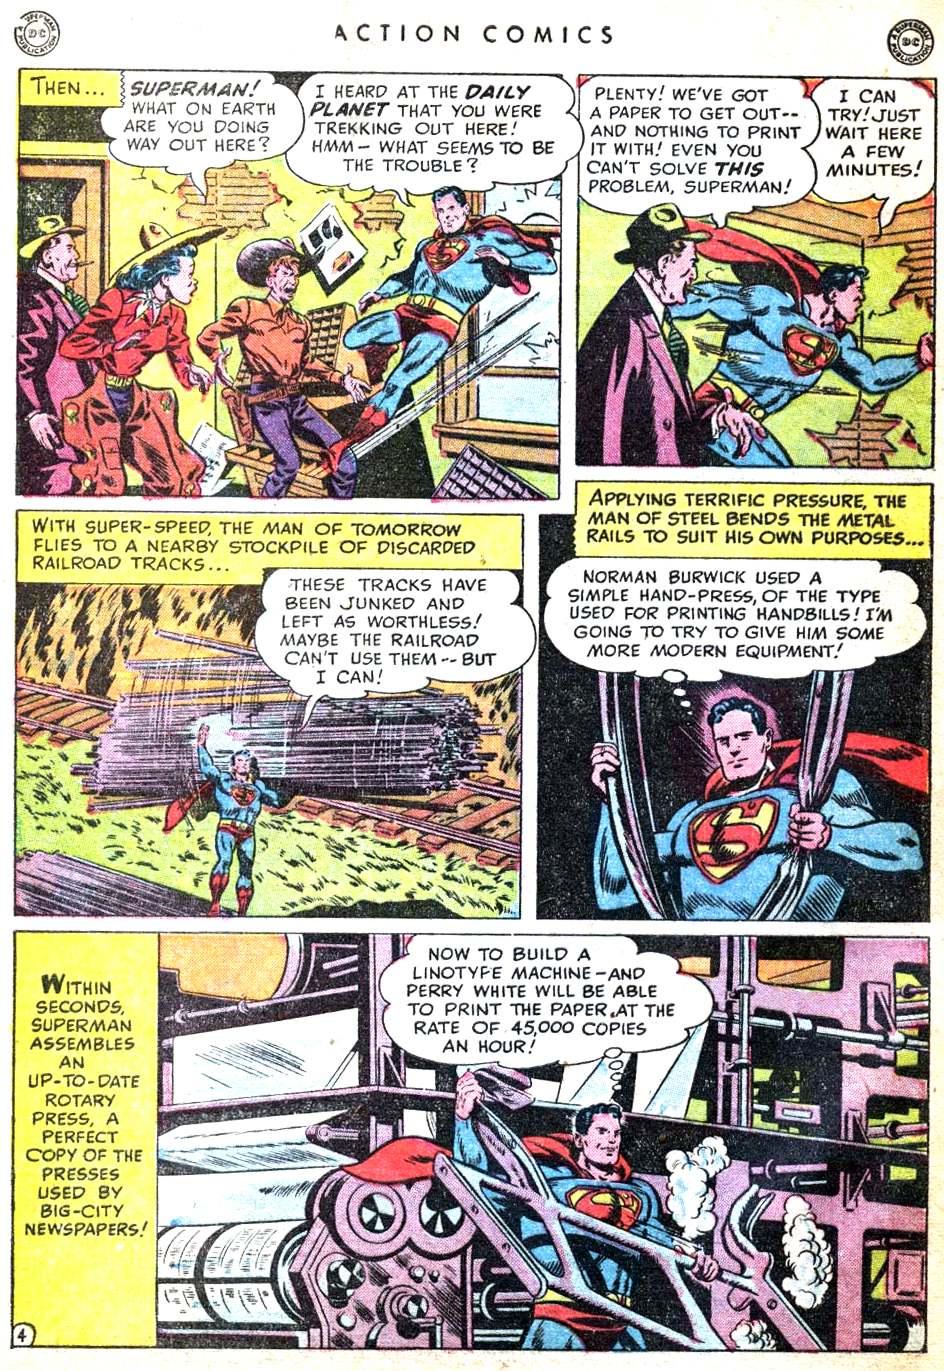 Action Comics (1938) 134 Page 5